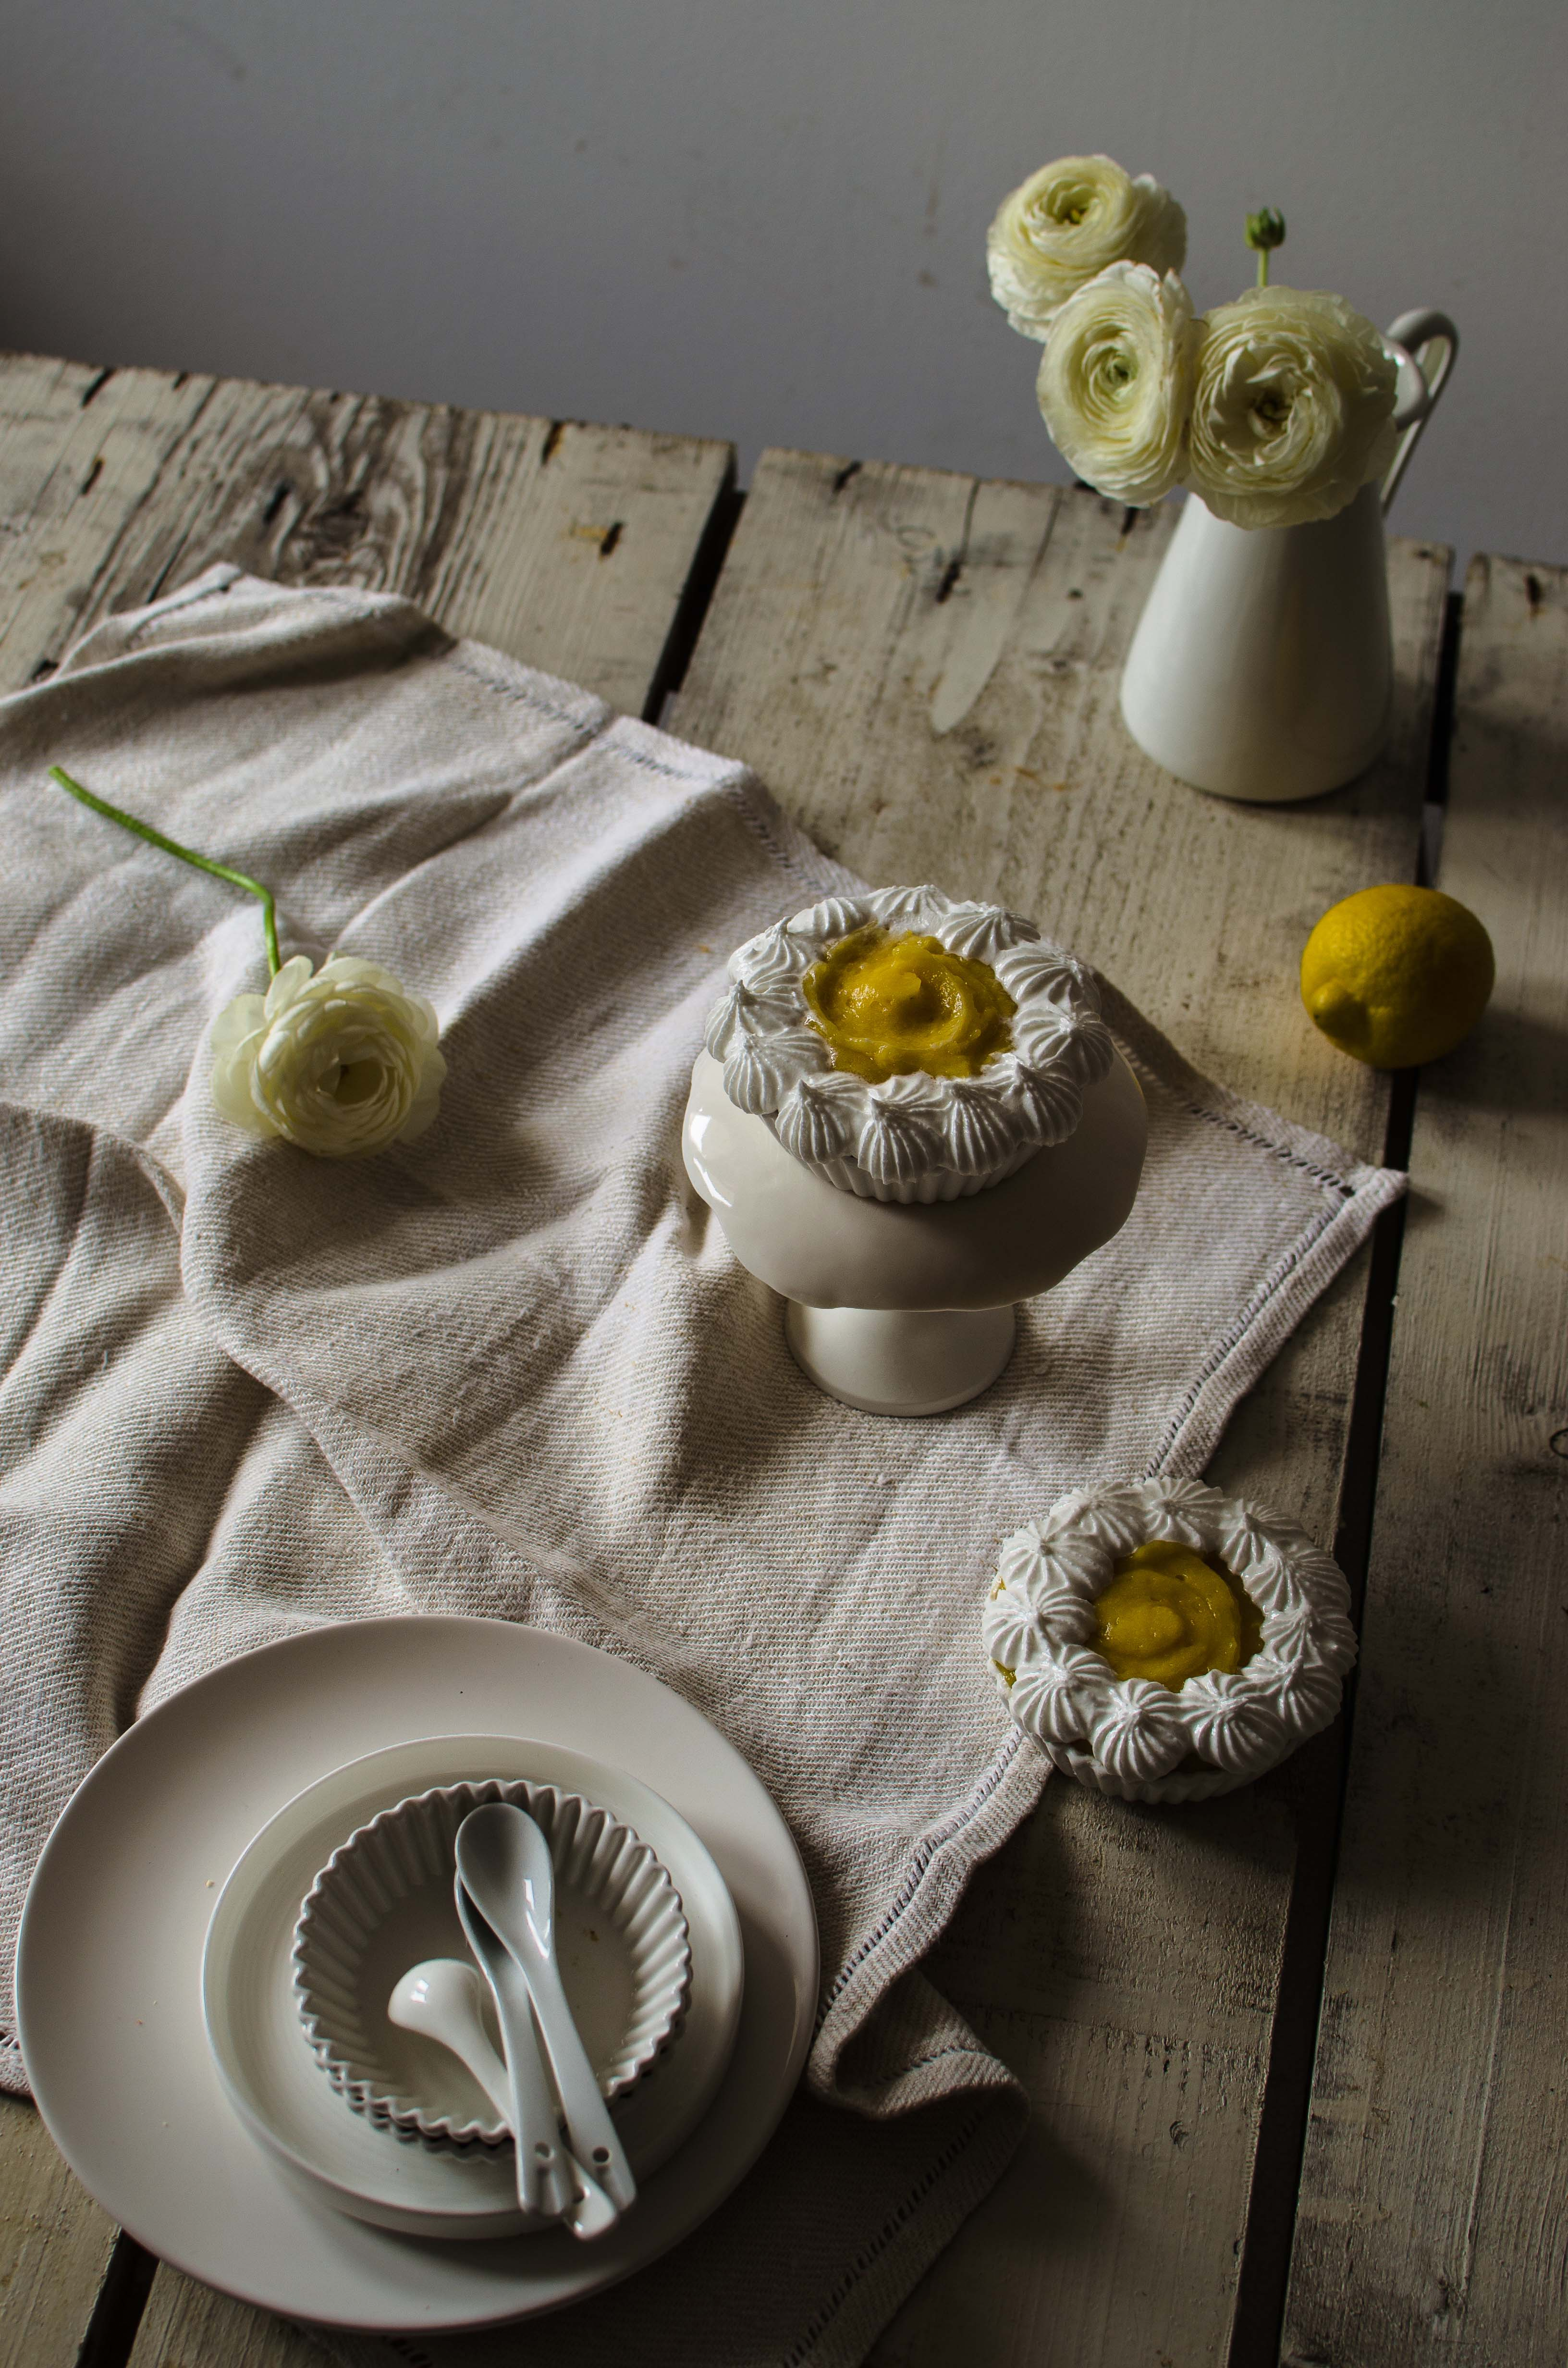 torta_meringa_limoone Financiers alle mandorle, crema al limone e meringa